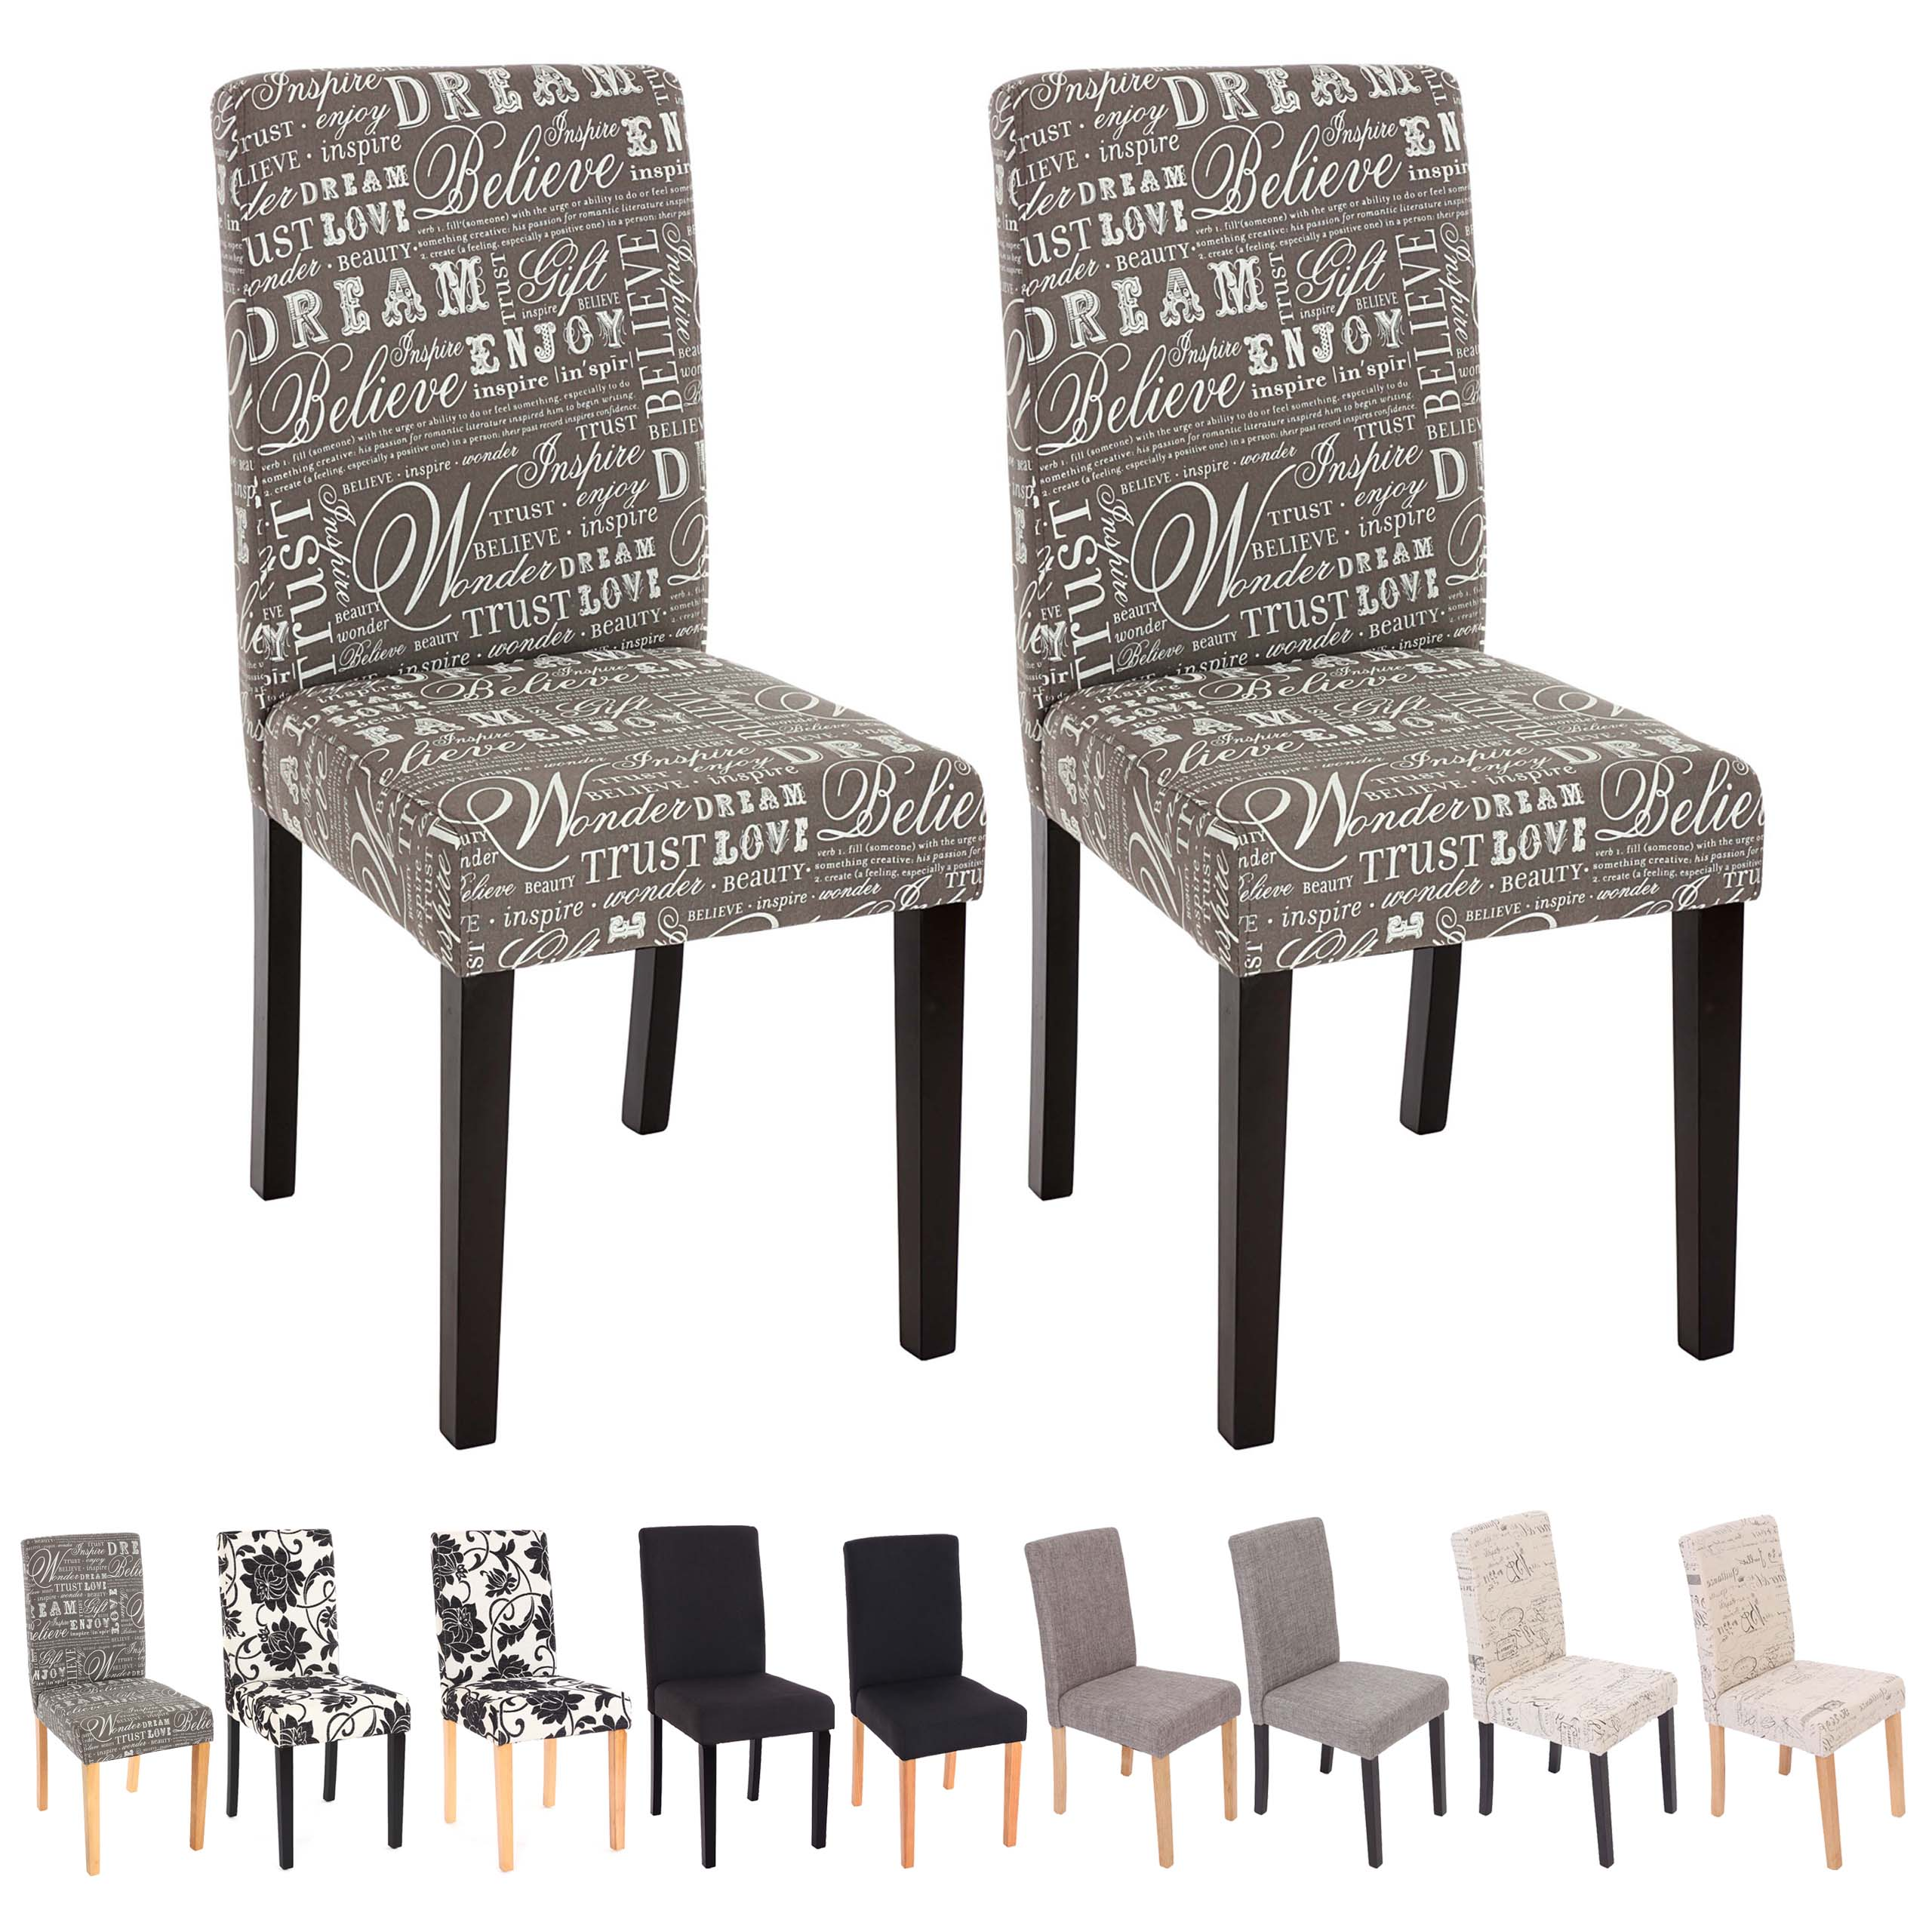 6x esszimmerstuhl stuhl lehnstuhl littau textil uni jacquard schriftzug ebay. Black Bedroom Furniture Sets. Home Design Ideas